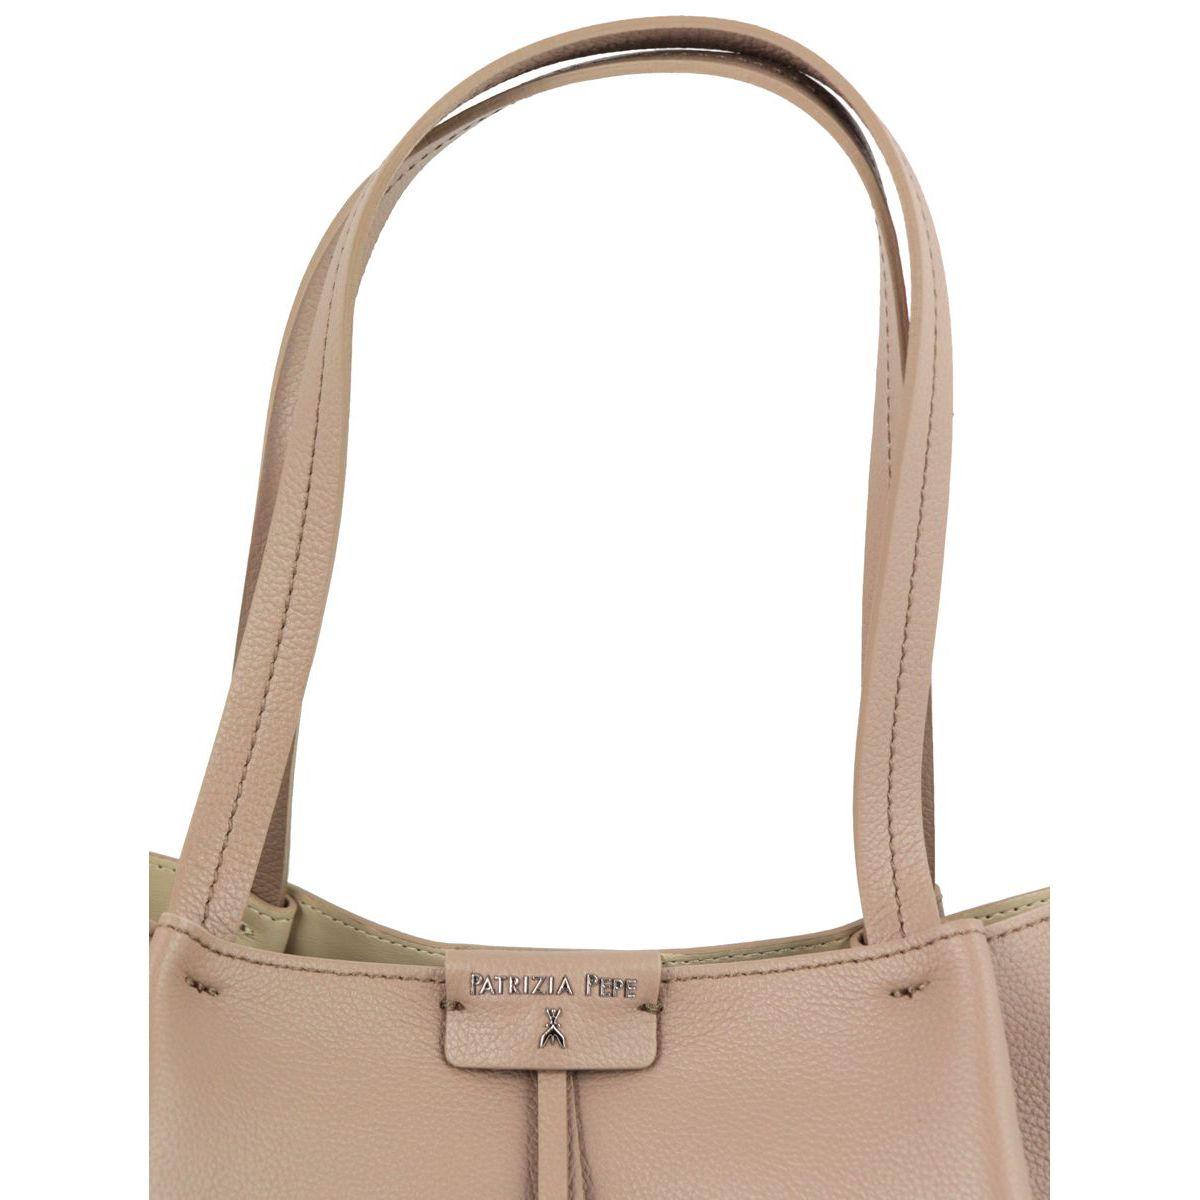 Shopper bag in cowhide leather with logo Tortora Patrizia Pepe